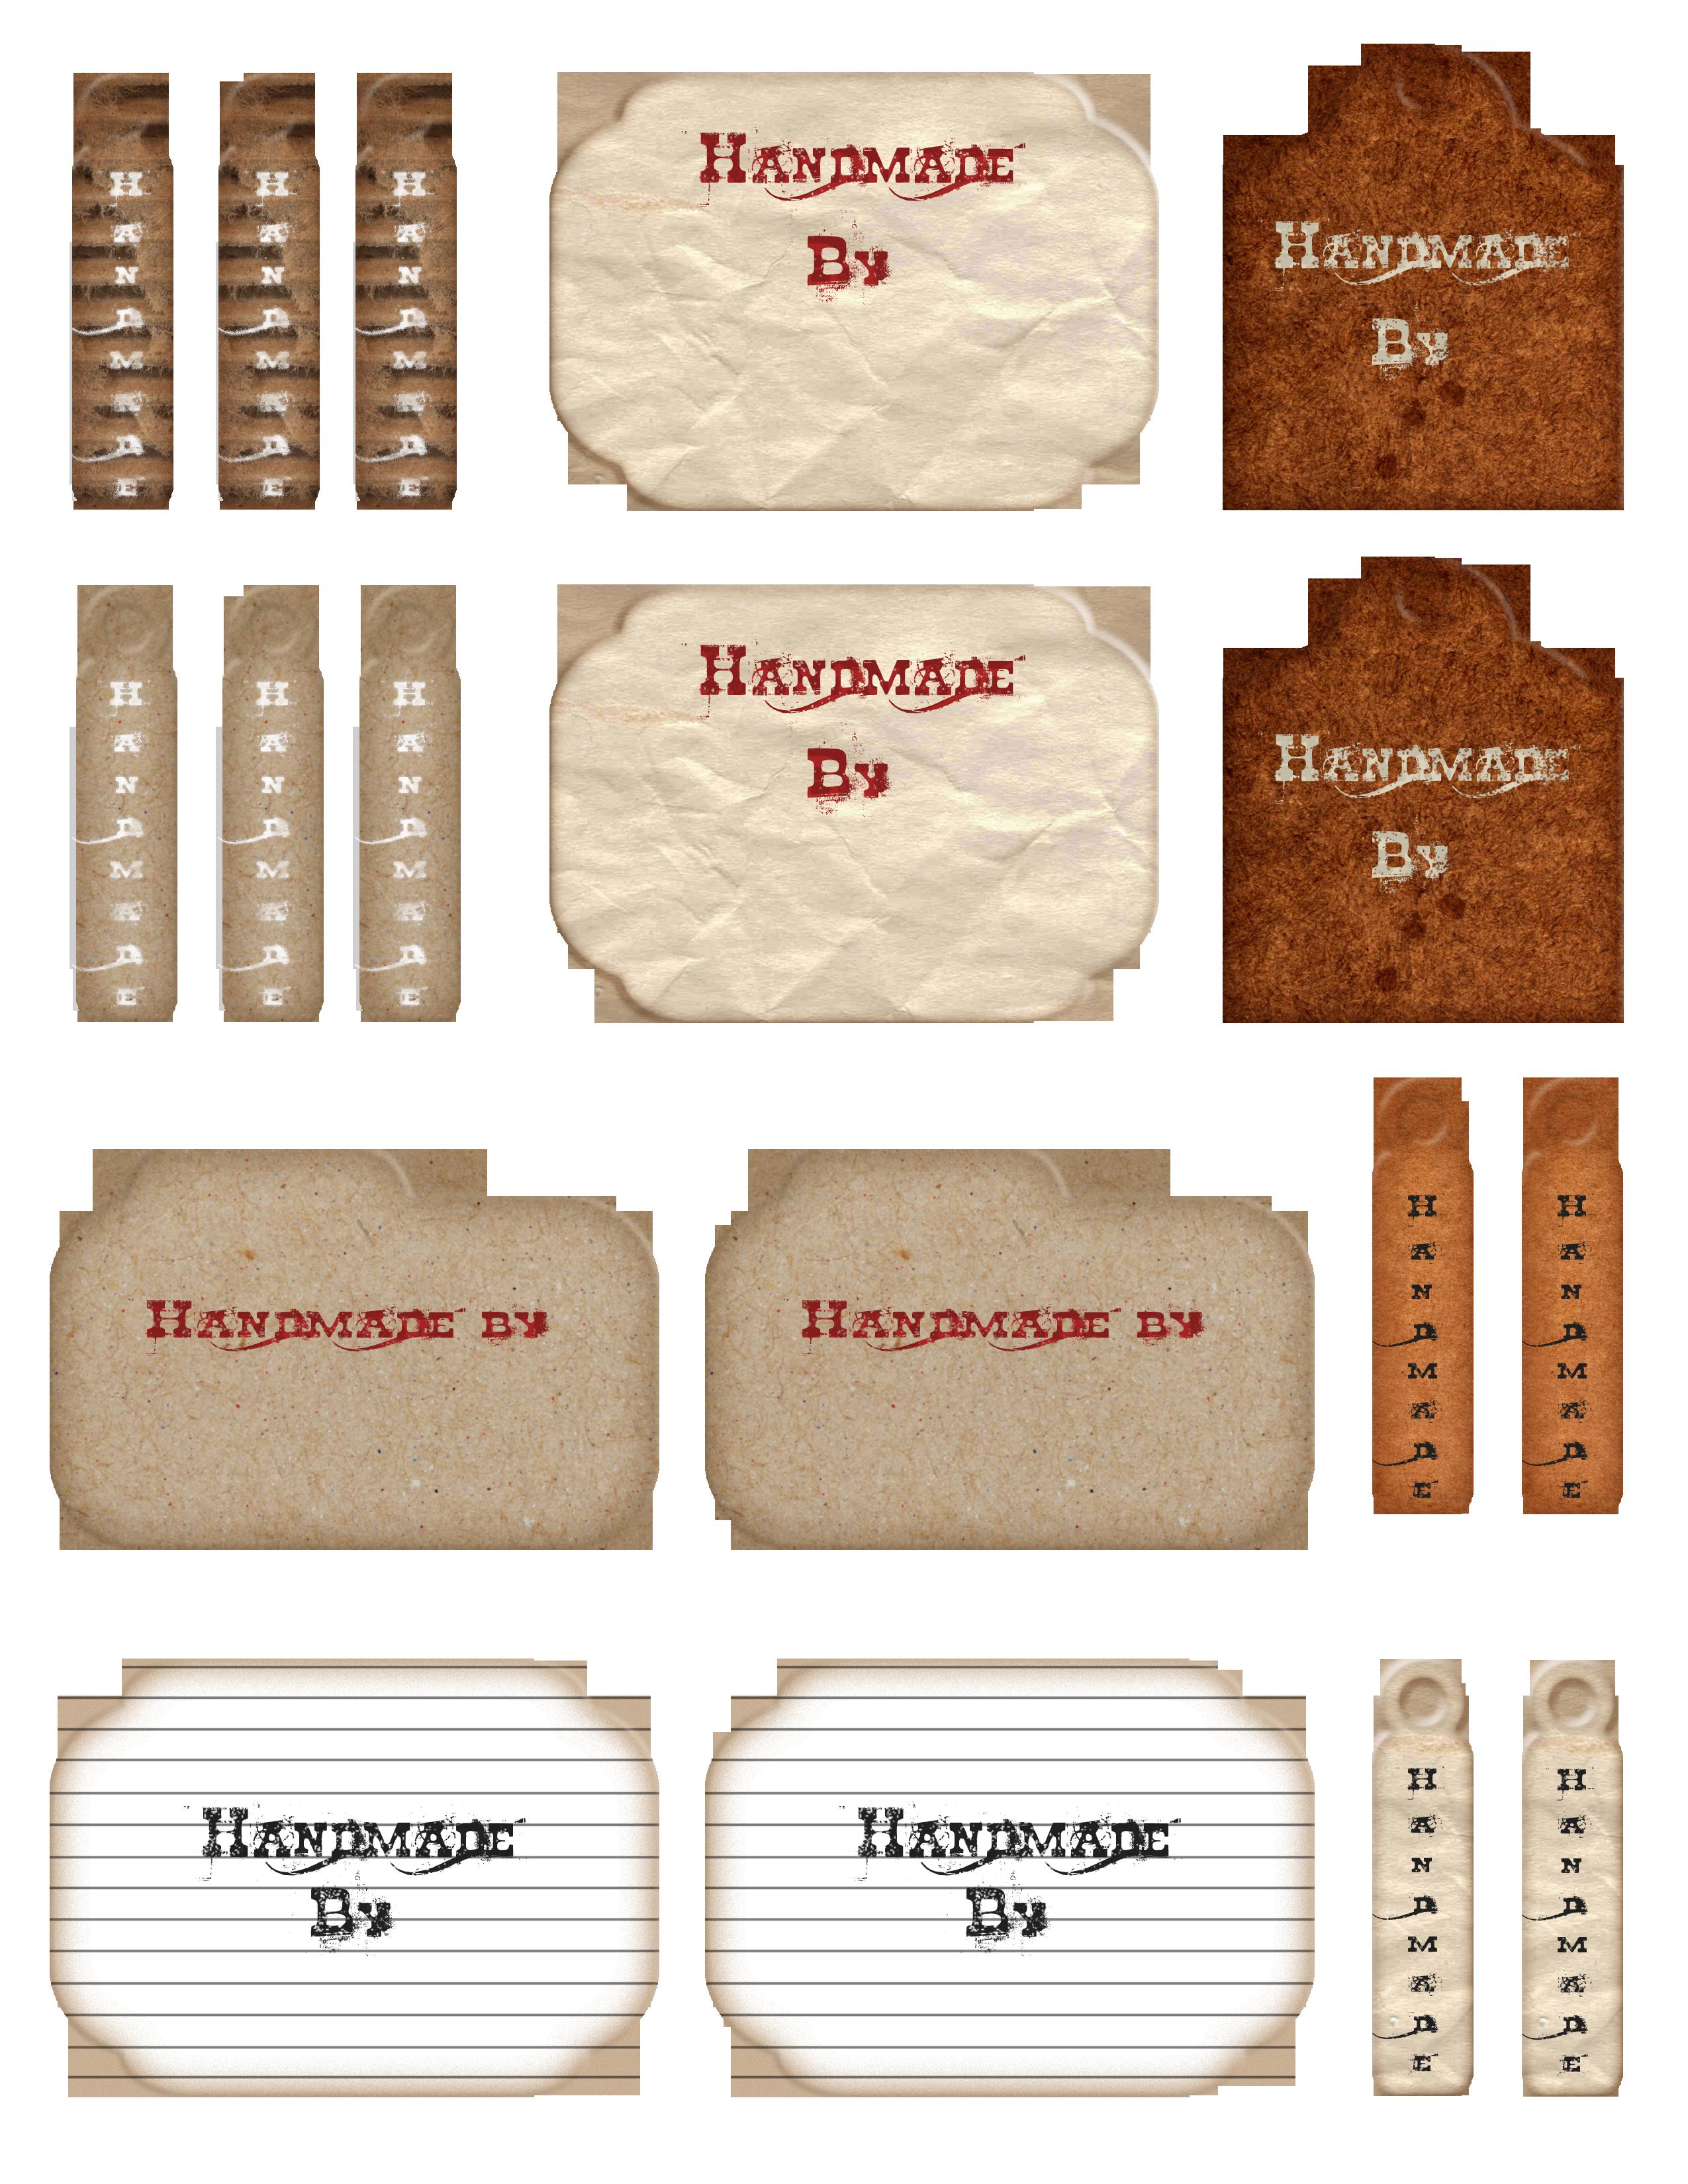 7 Images of Free Printable Handmade Tags